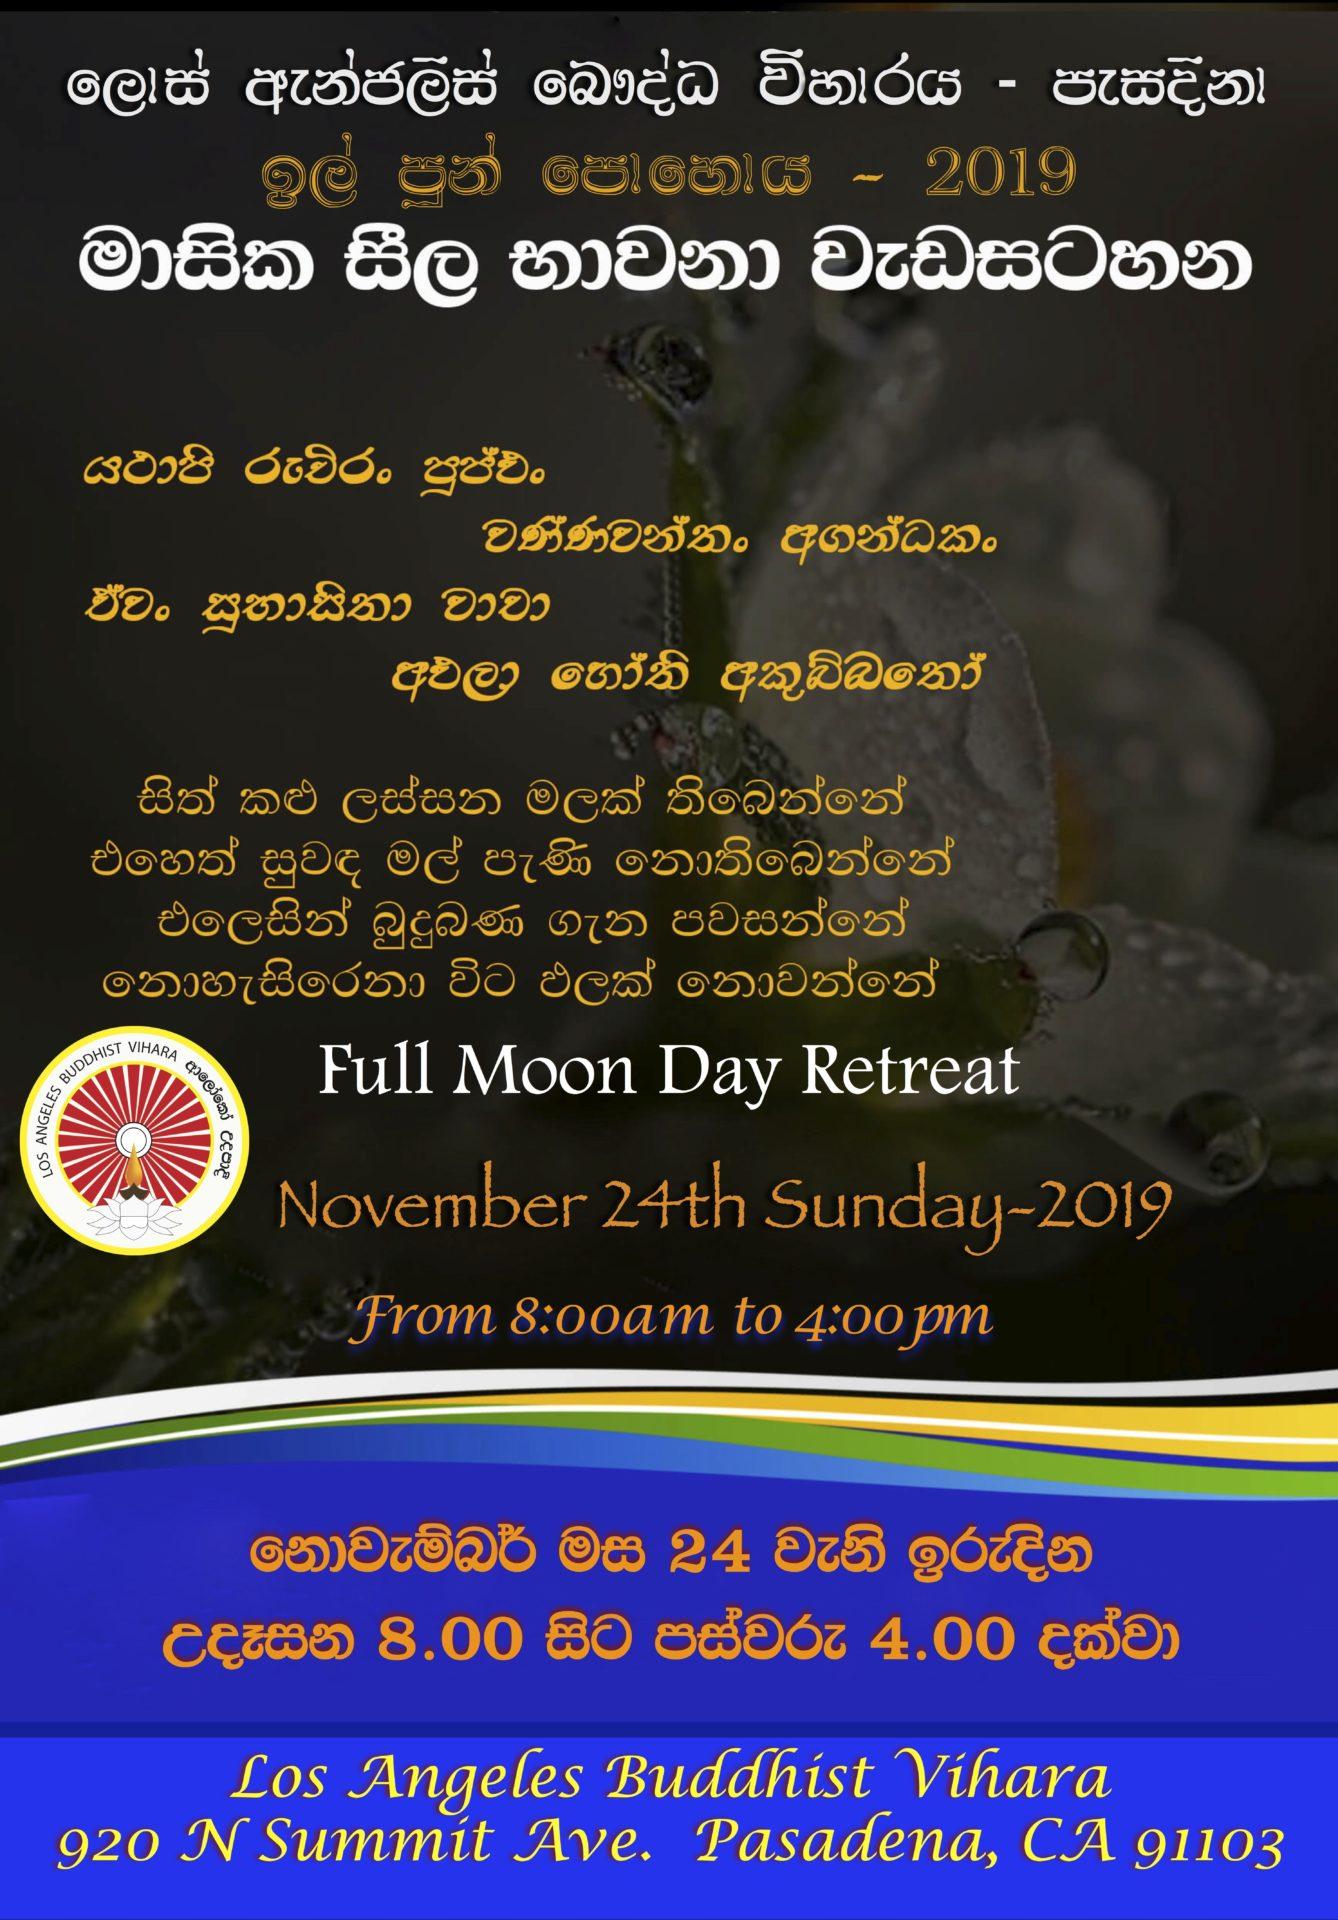 Full Moon Day Retreat